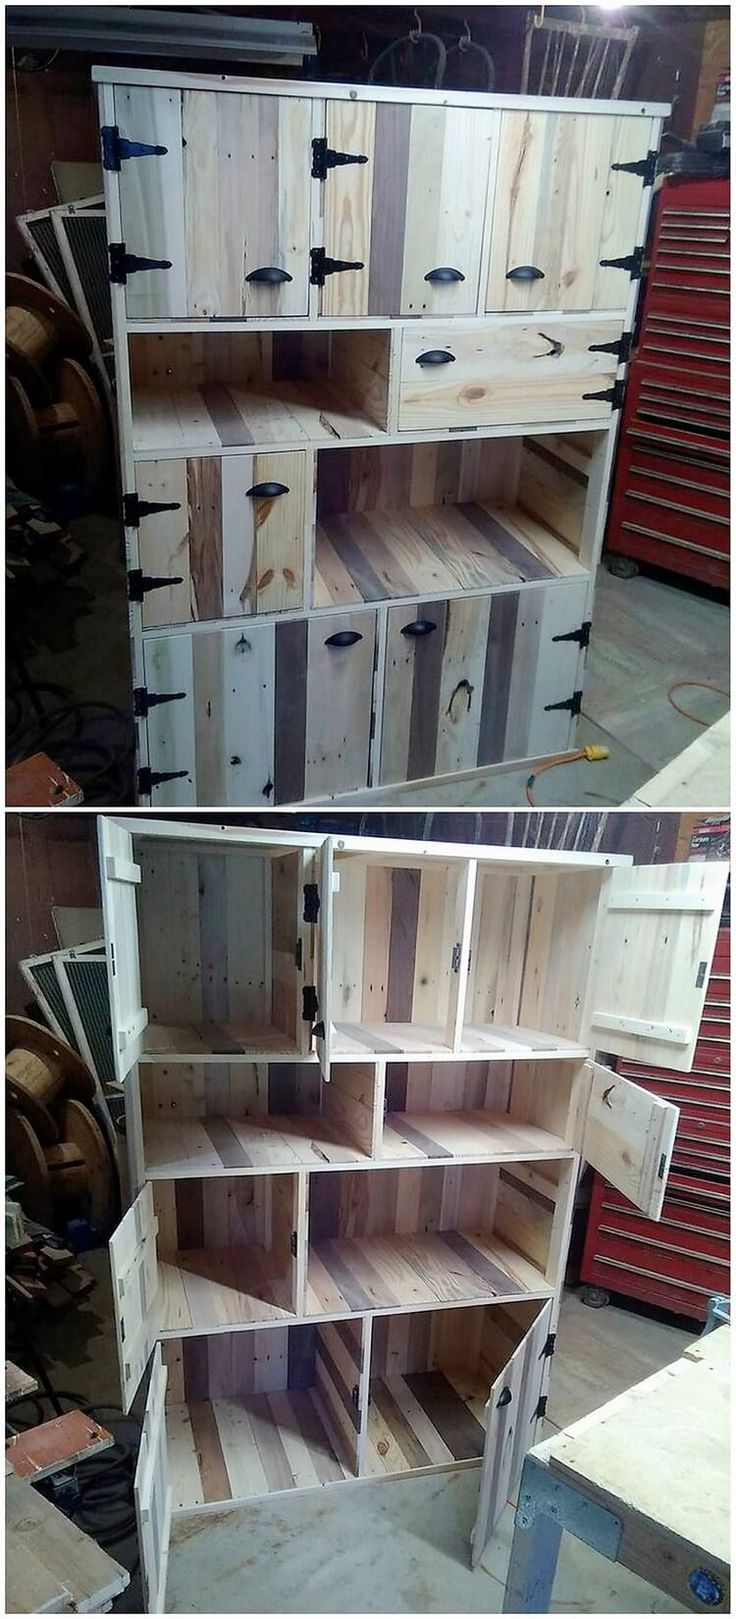 best 25 pallet hutch ideas on pinterest diy exterior led lighting how to stain pallet. Black Bedroom Furniture Sets. Home Design Ideas